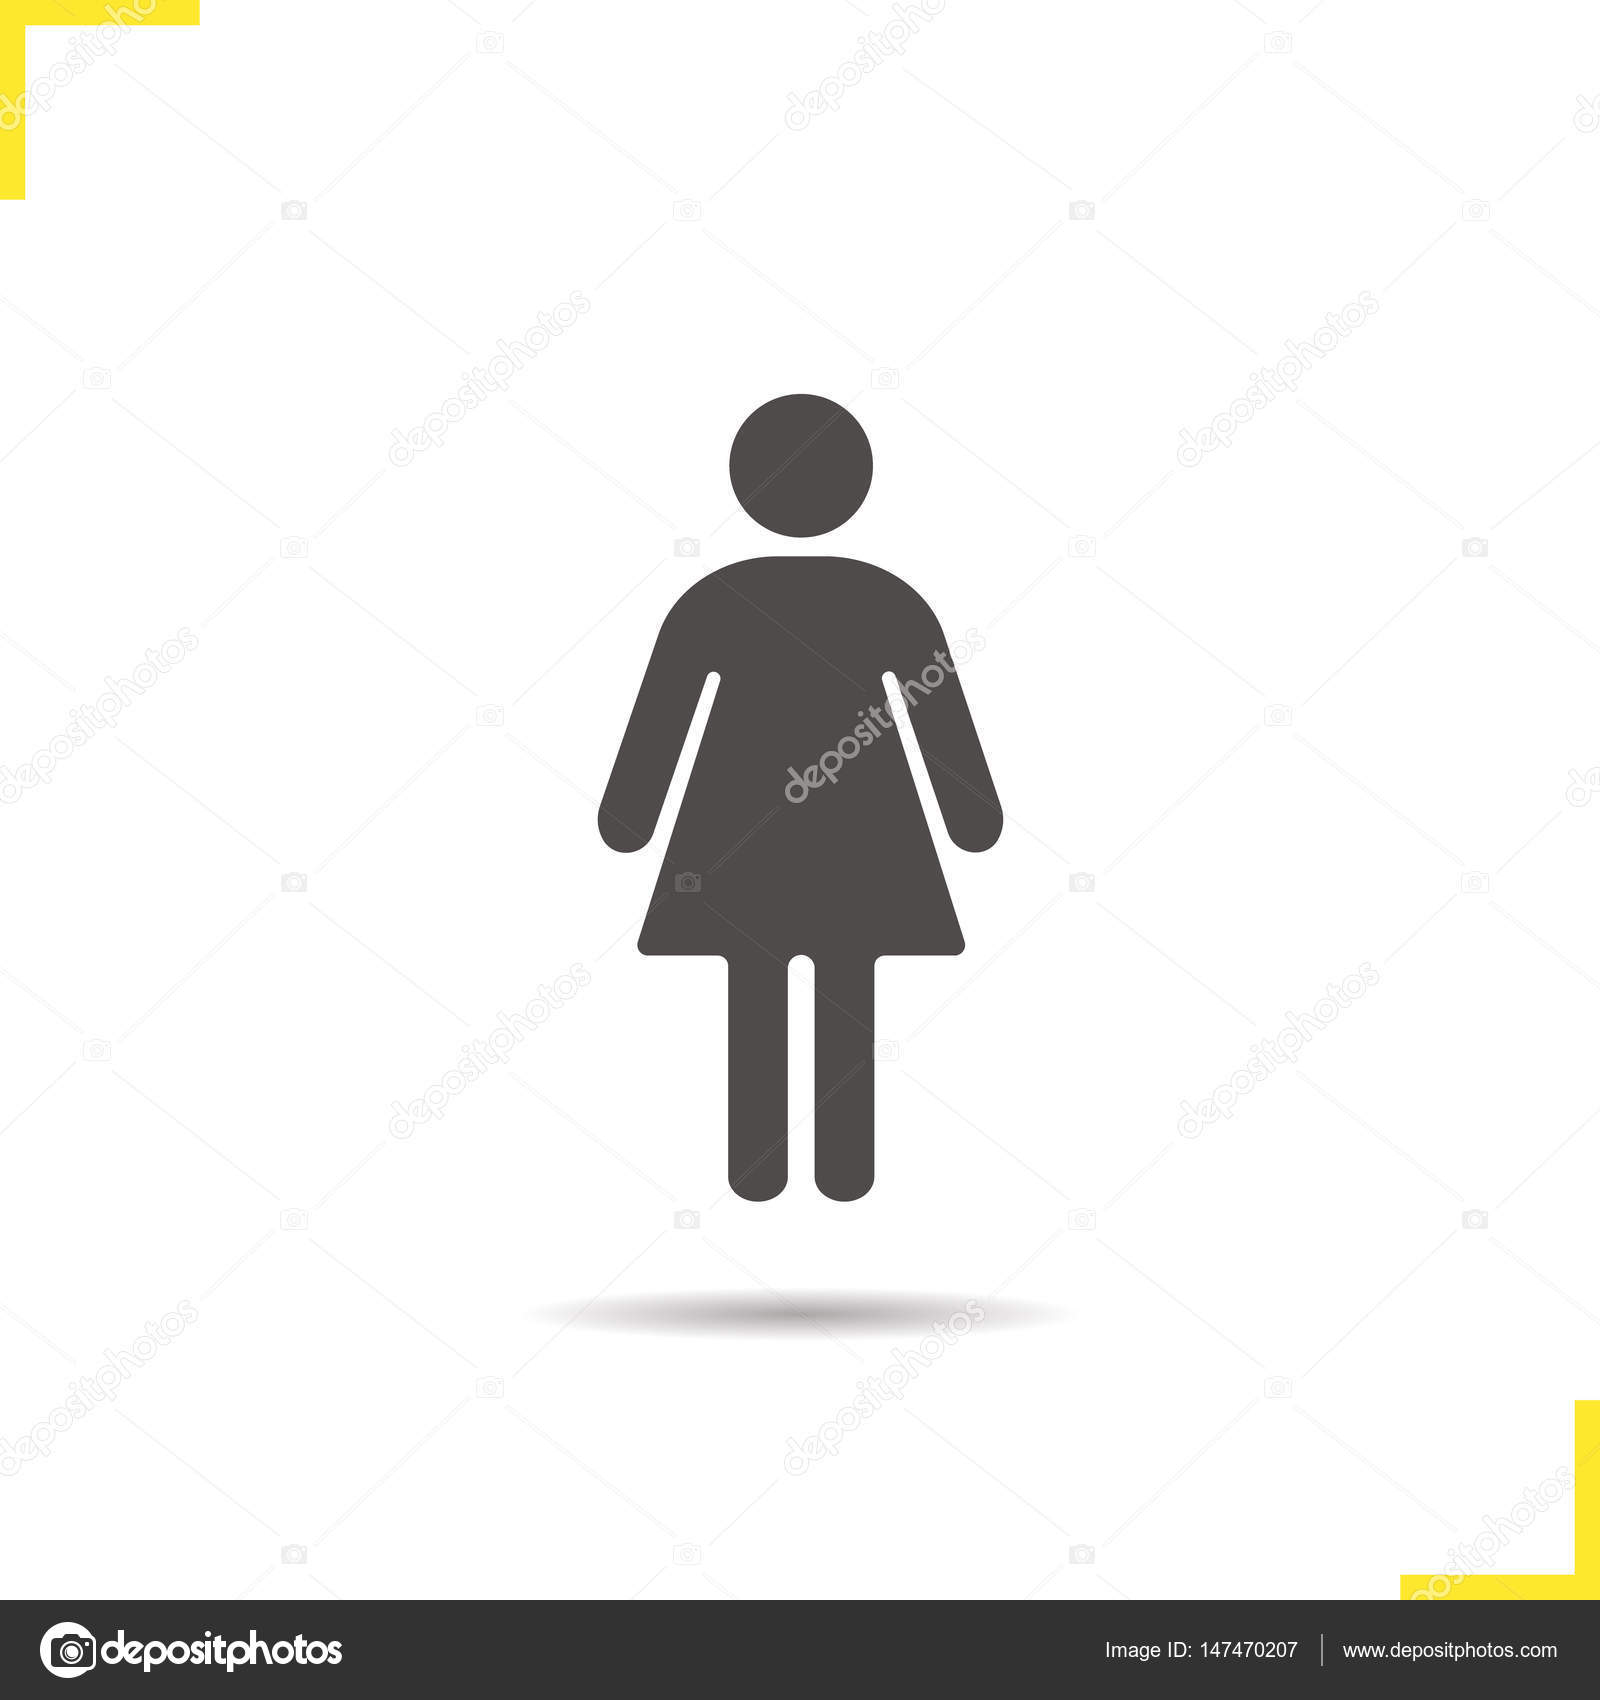 Woman icon silhouette